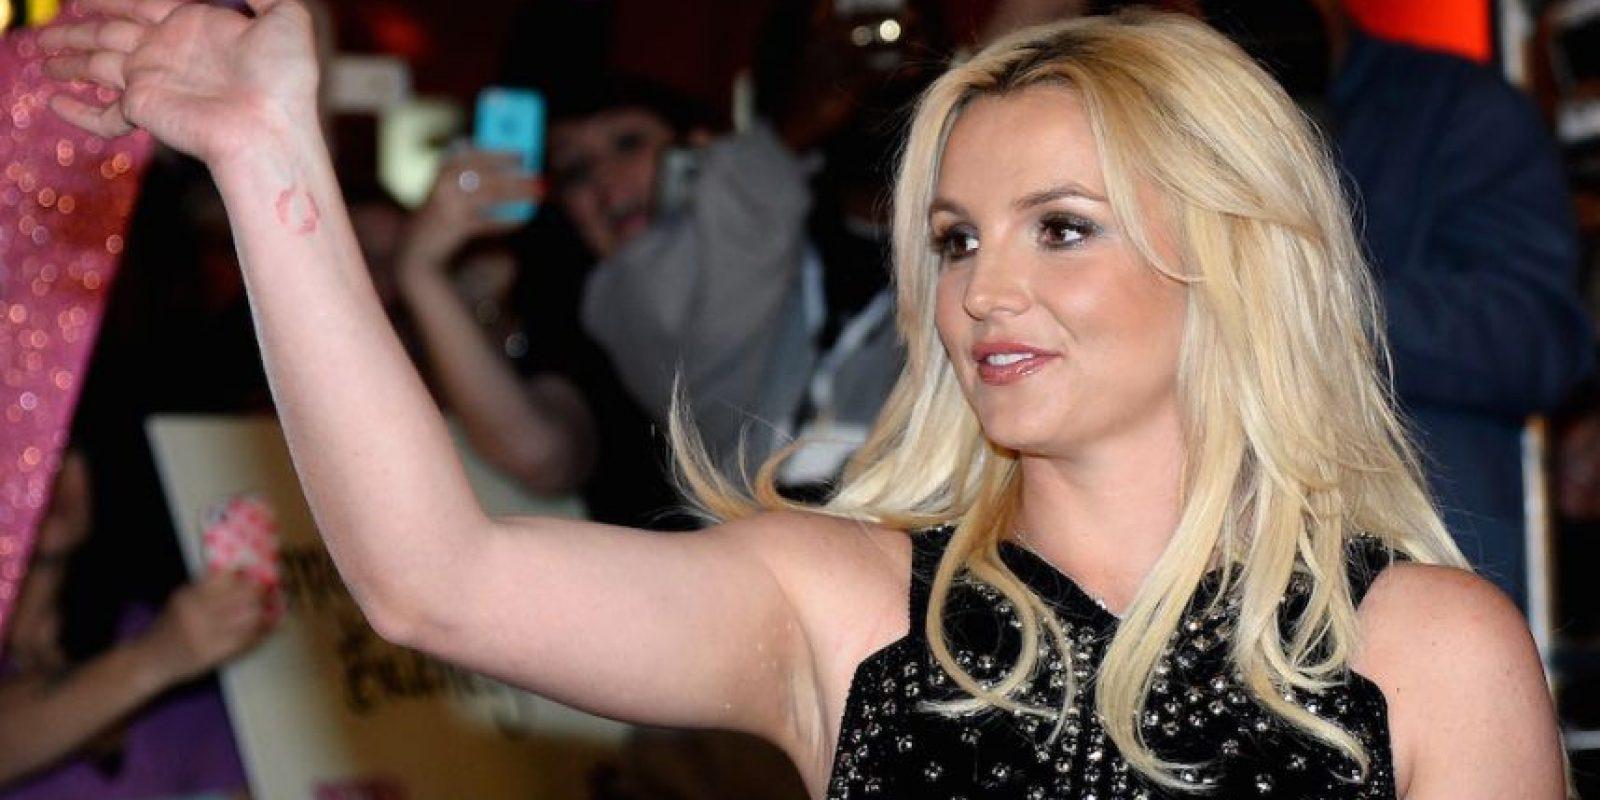 La cantante ganó 20 millones de dólares. Foto:Getty Images